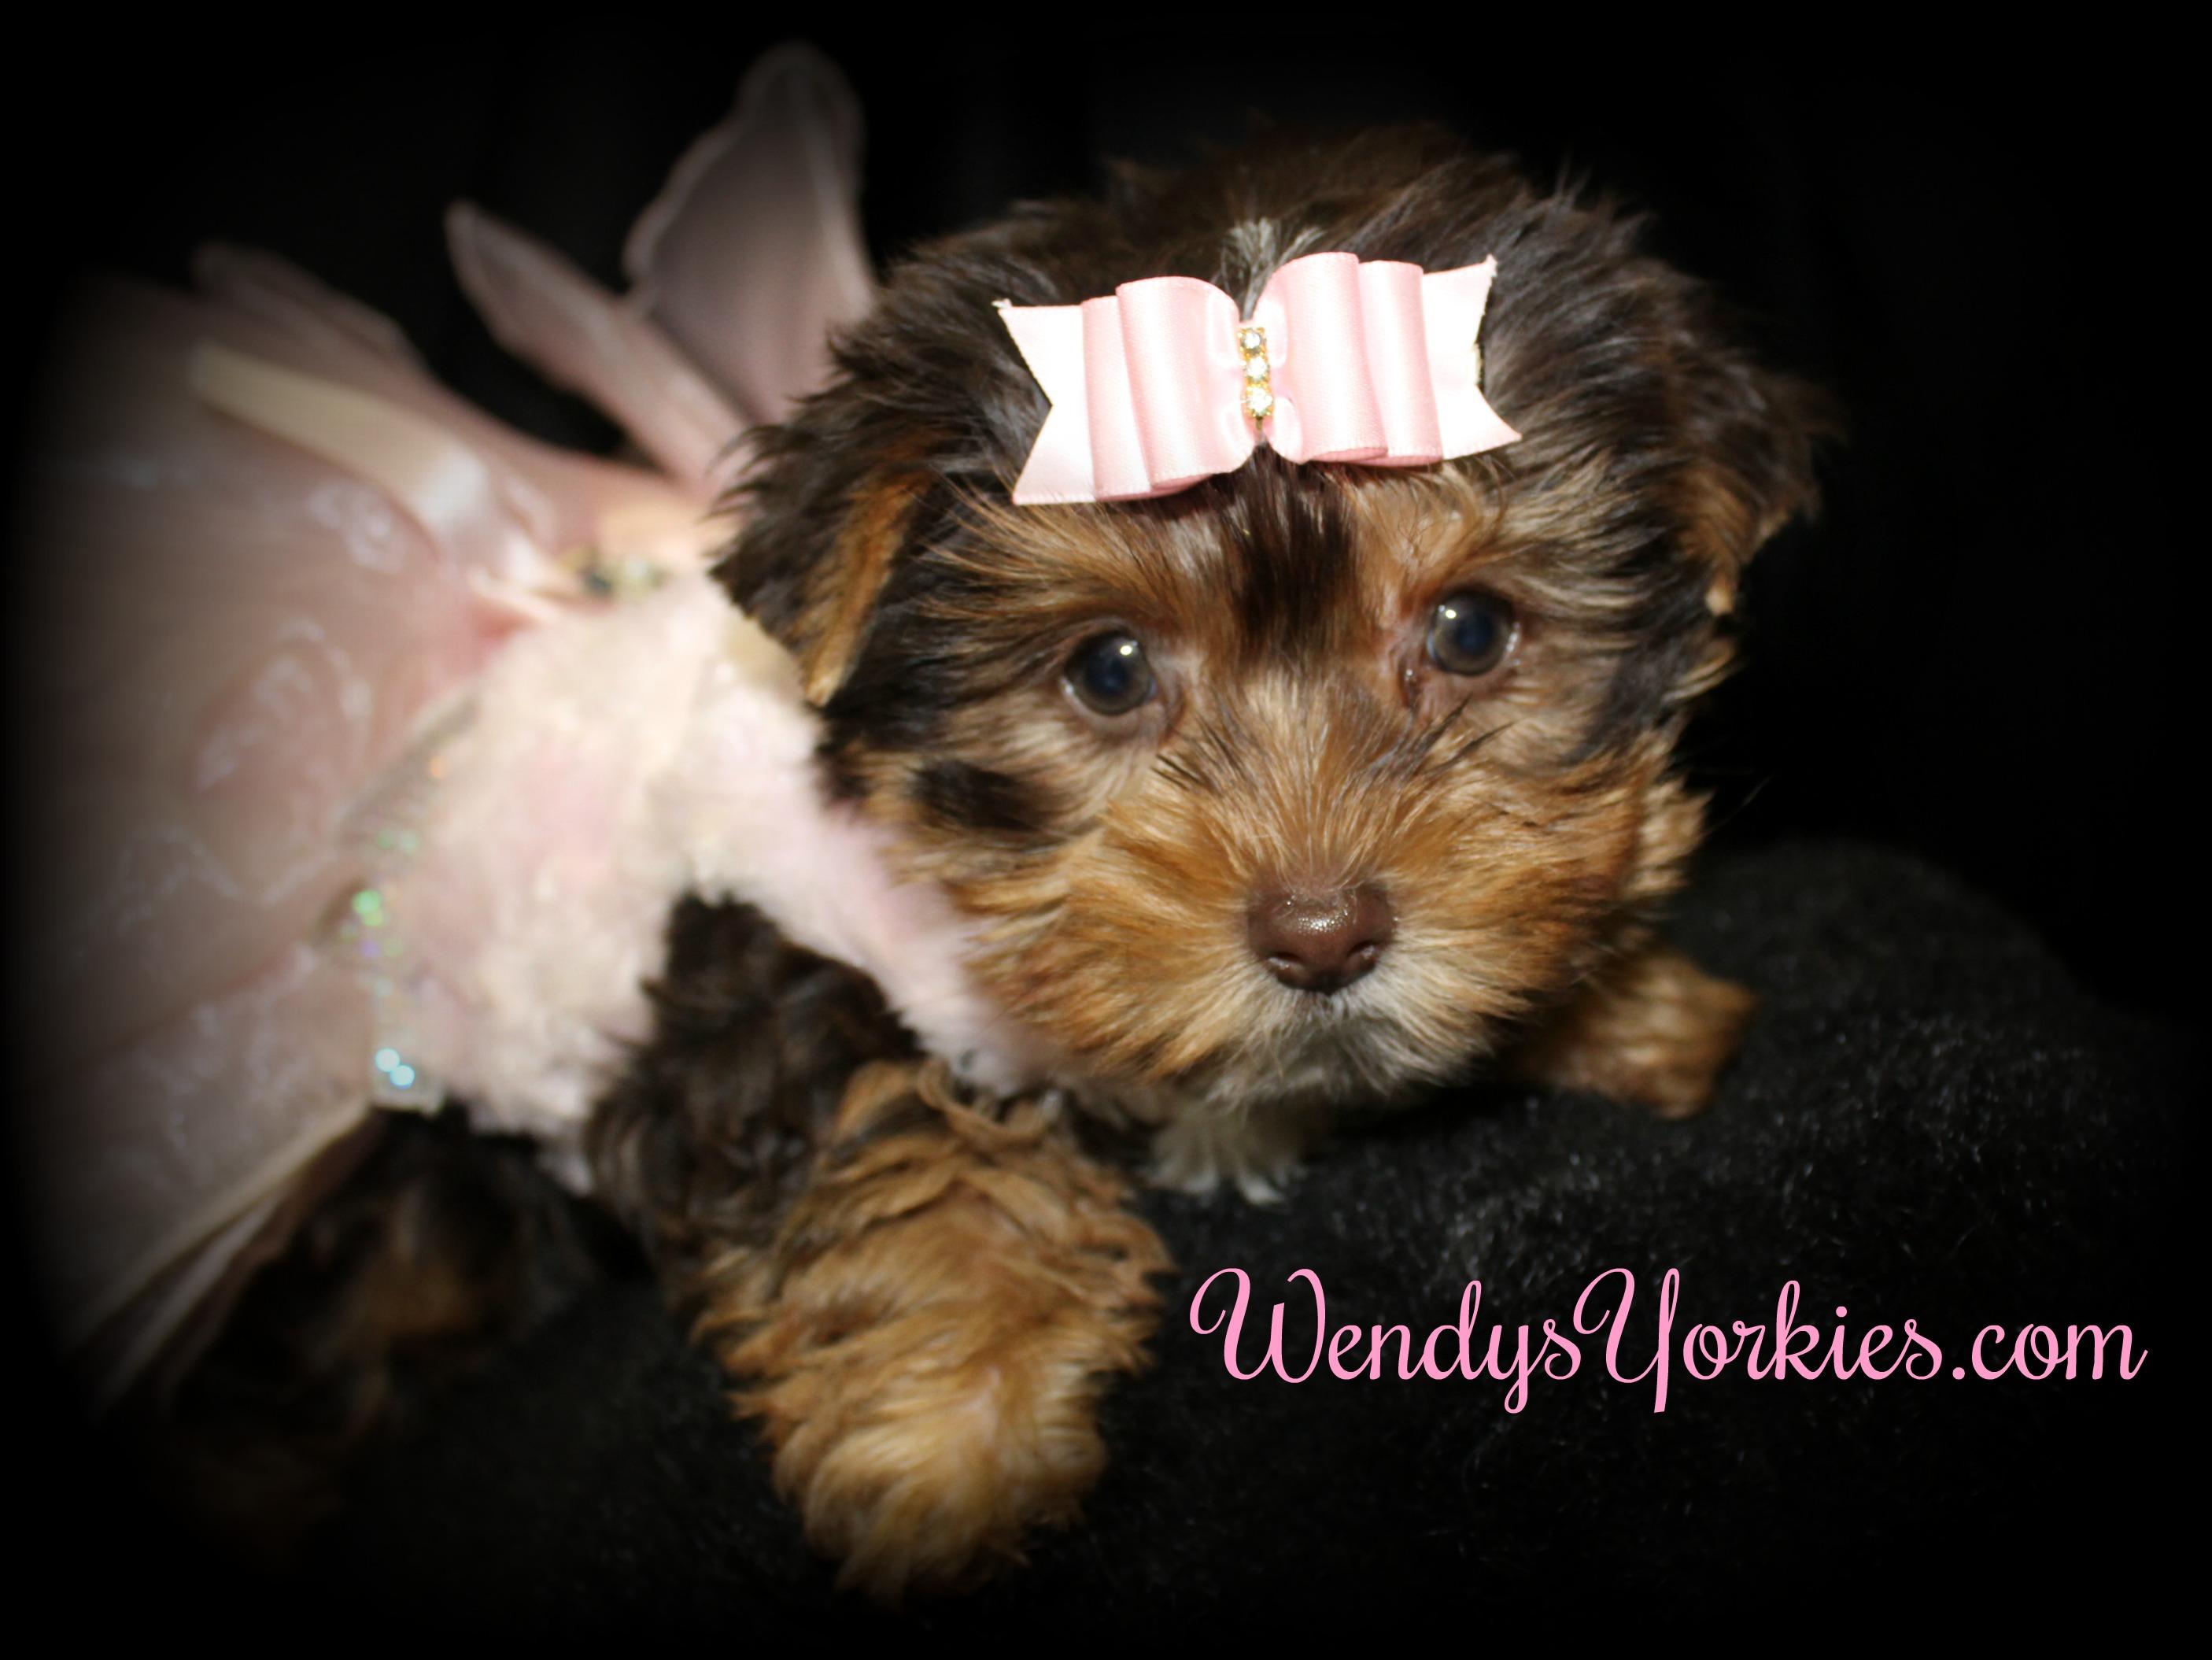 Female Chocolate Yorkie puppy for sale, WendysYorkies.com, Cf1